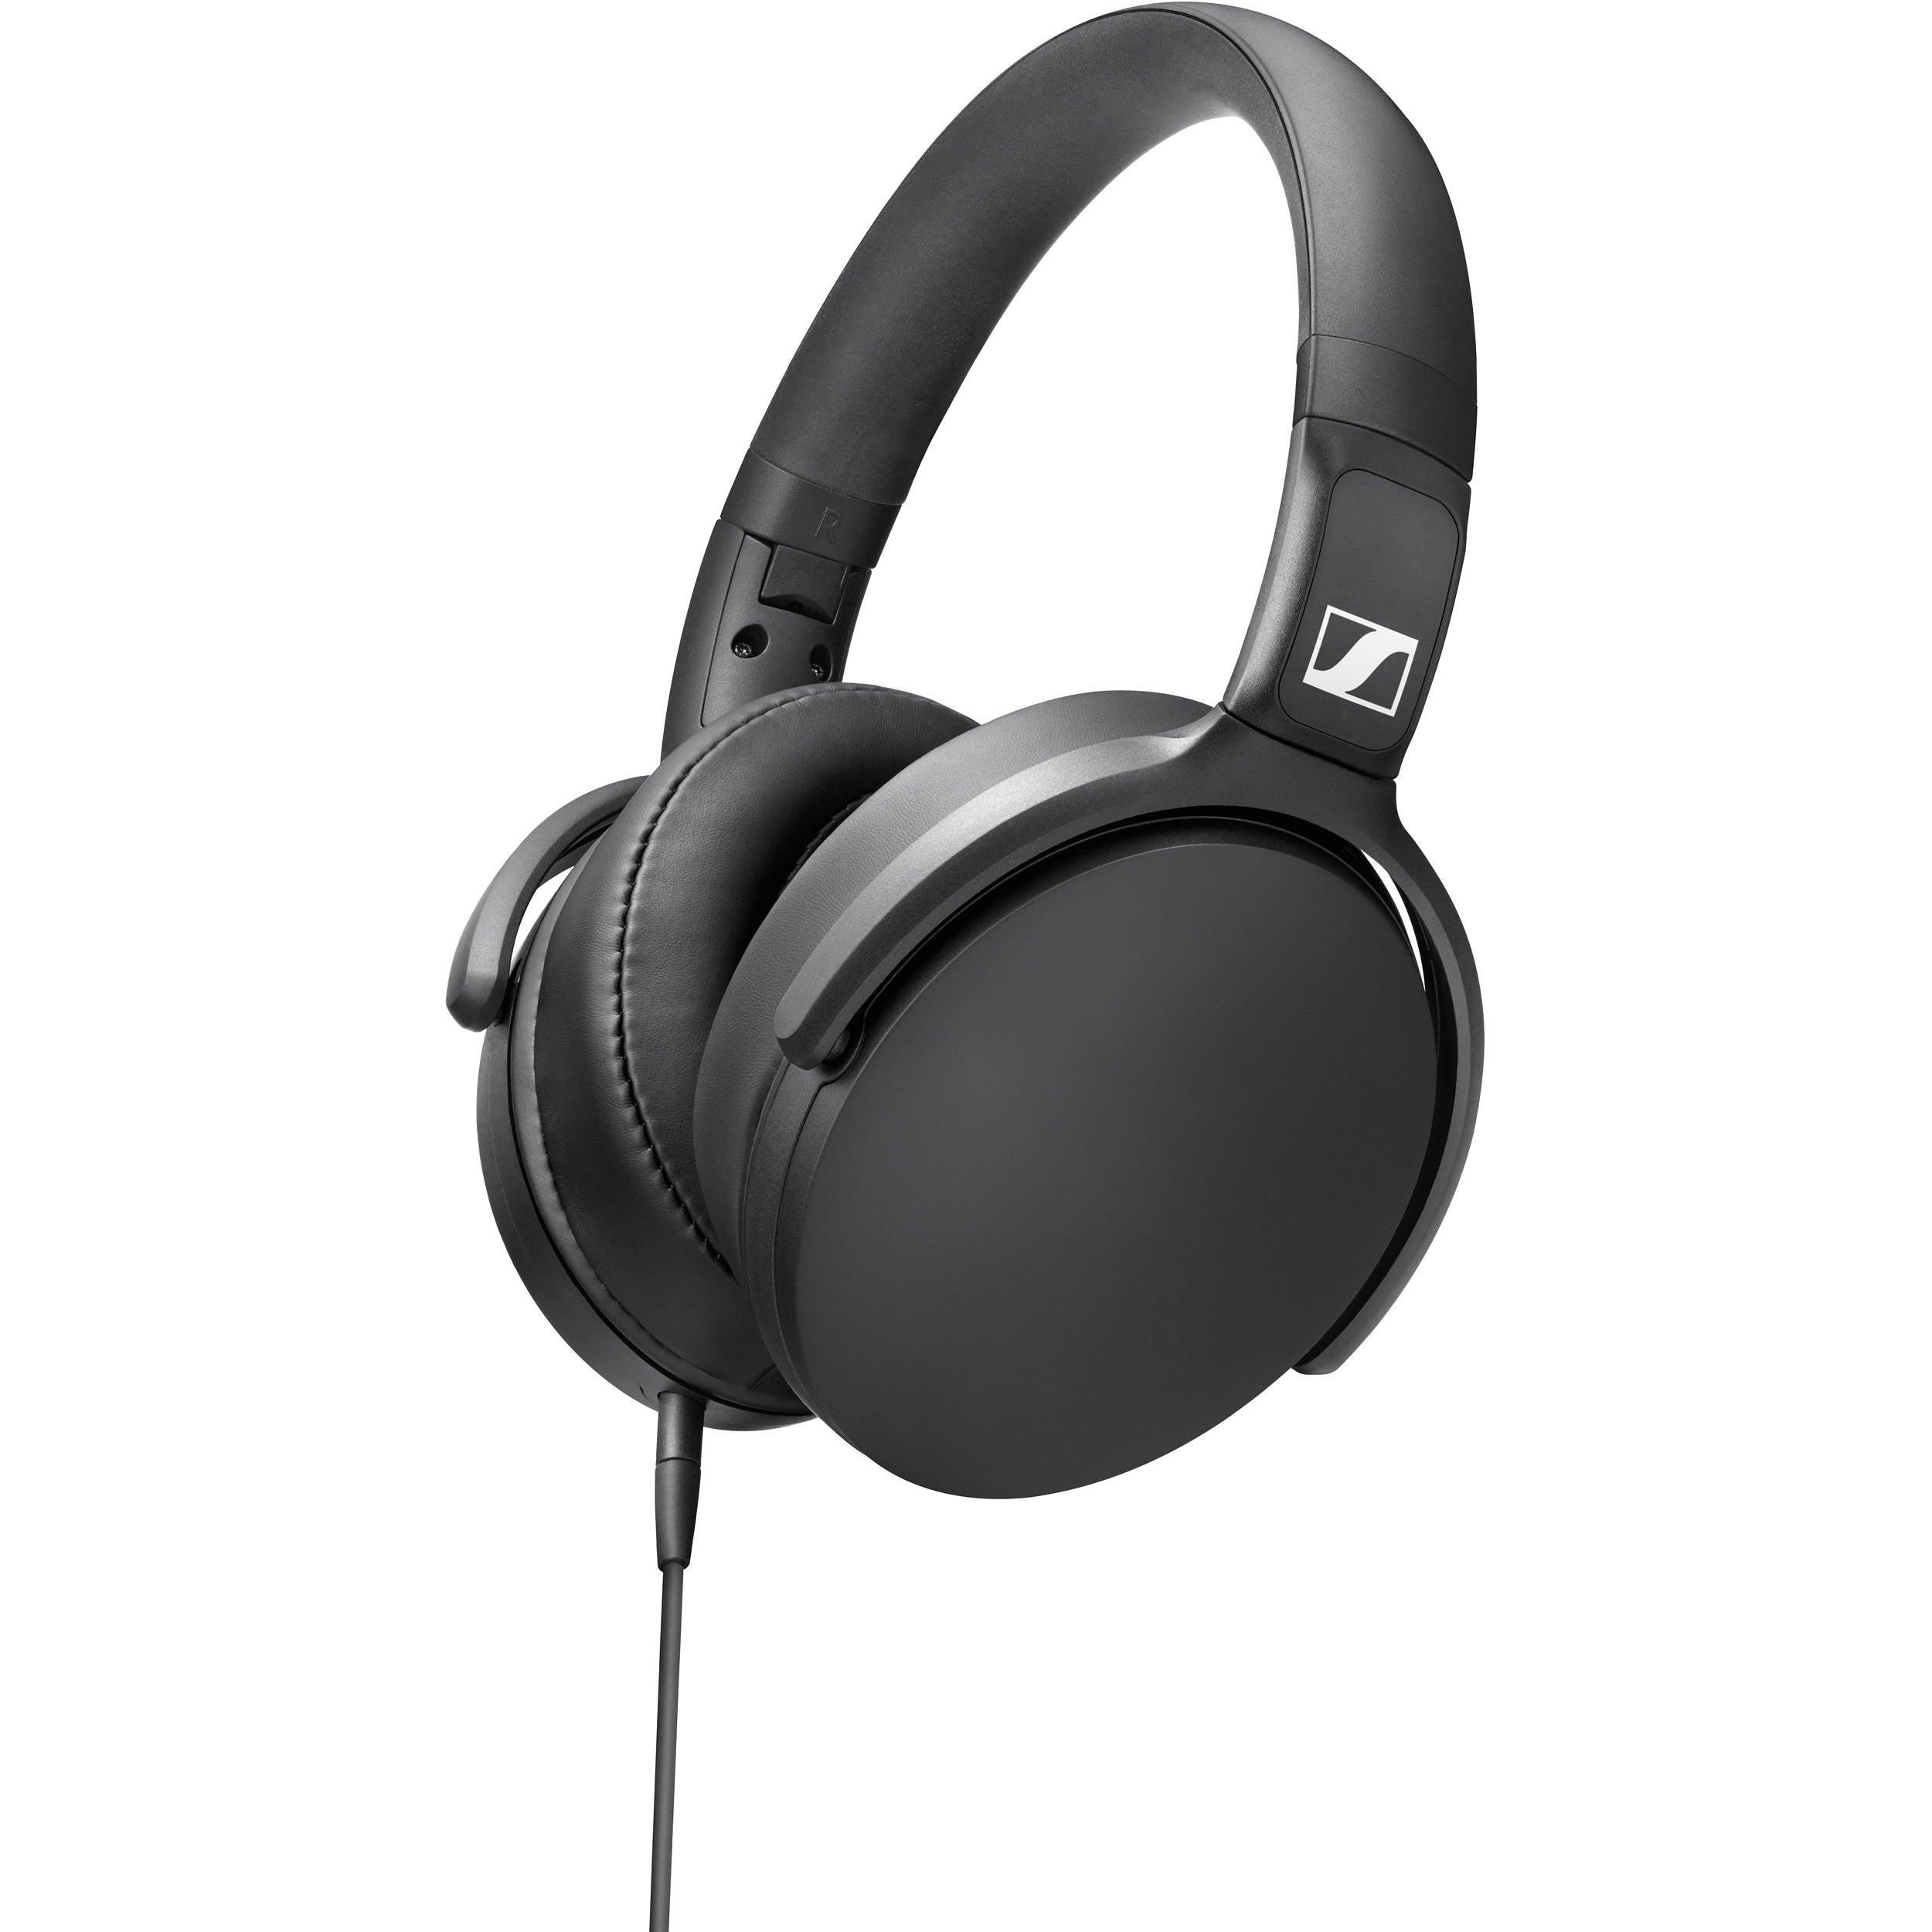 Sennheiser HD 400S Headphones